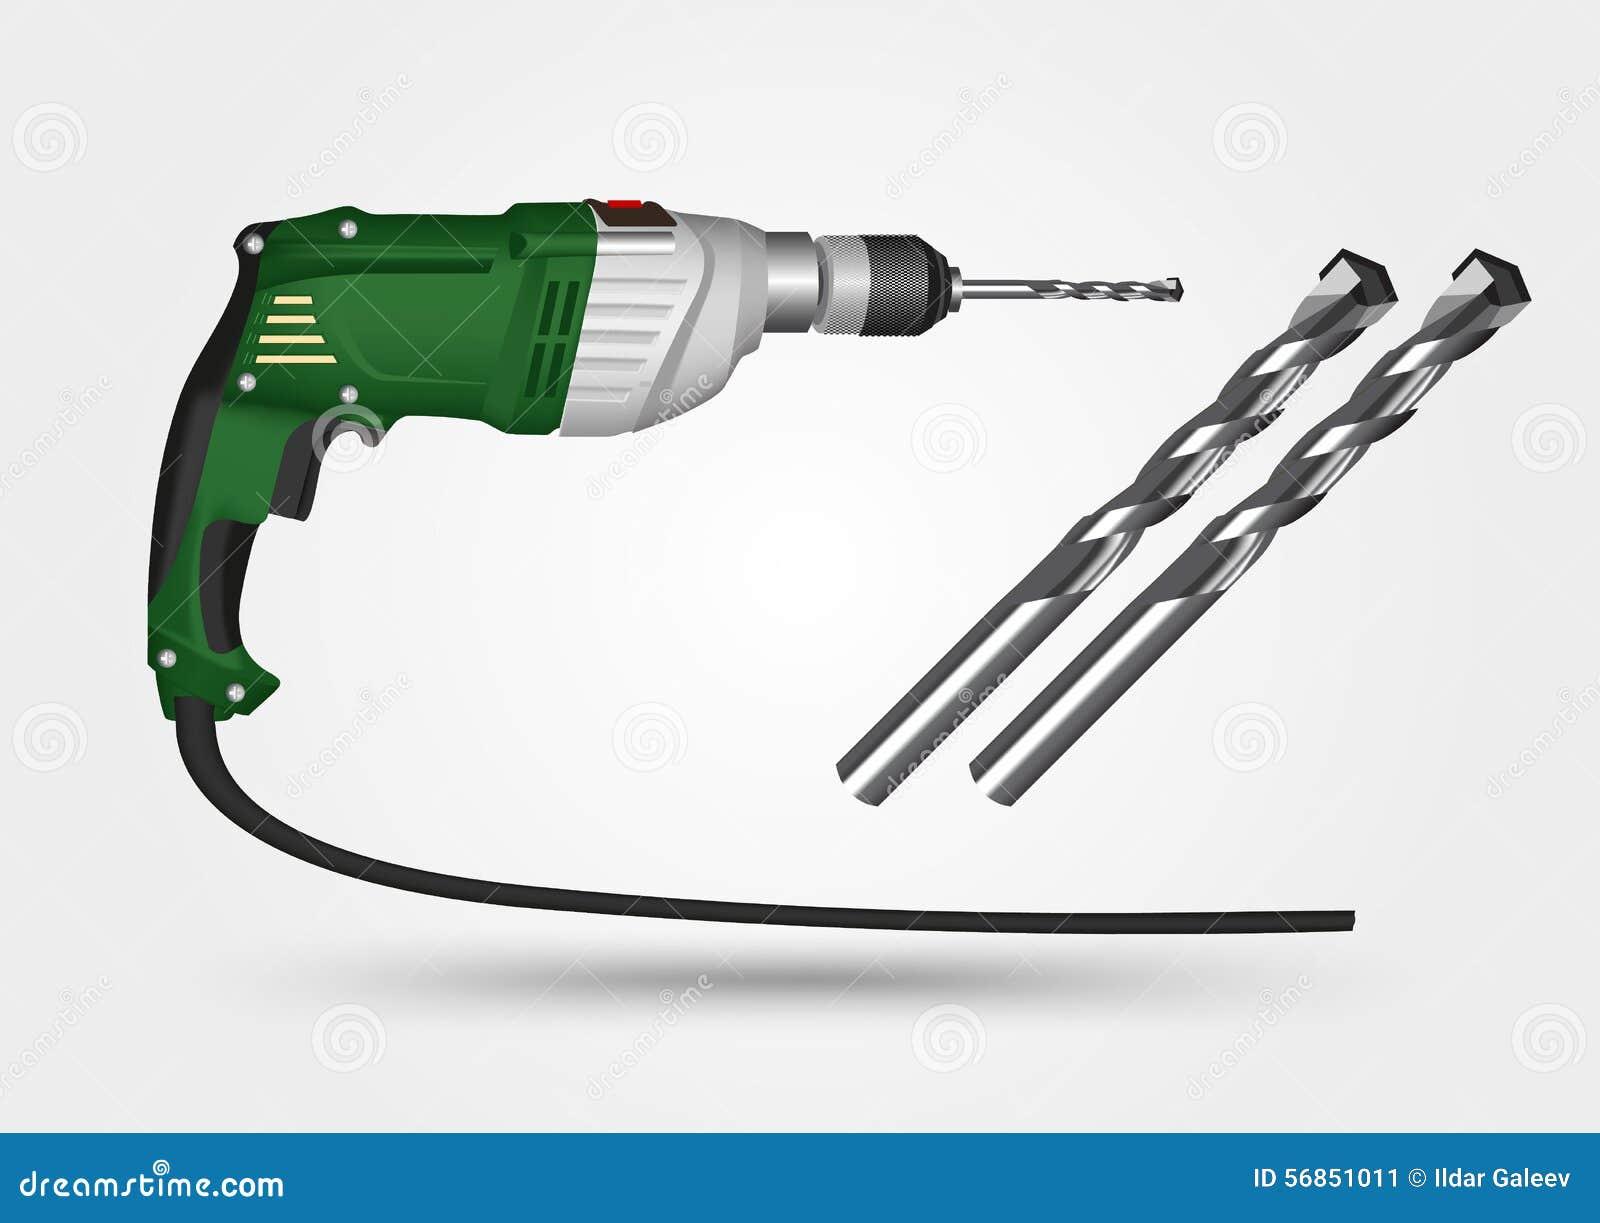 Drill Bit Illustration